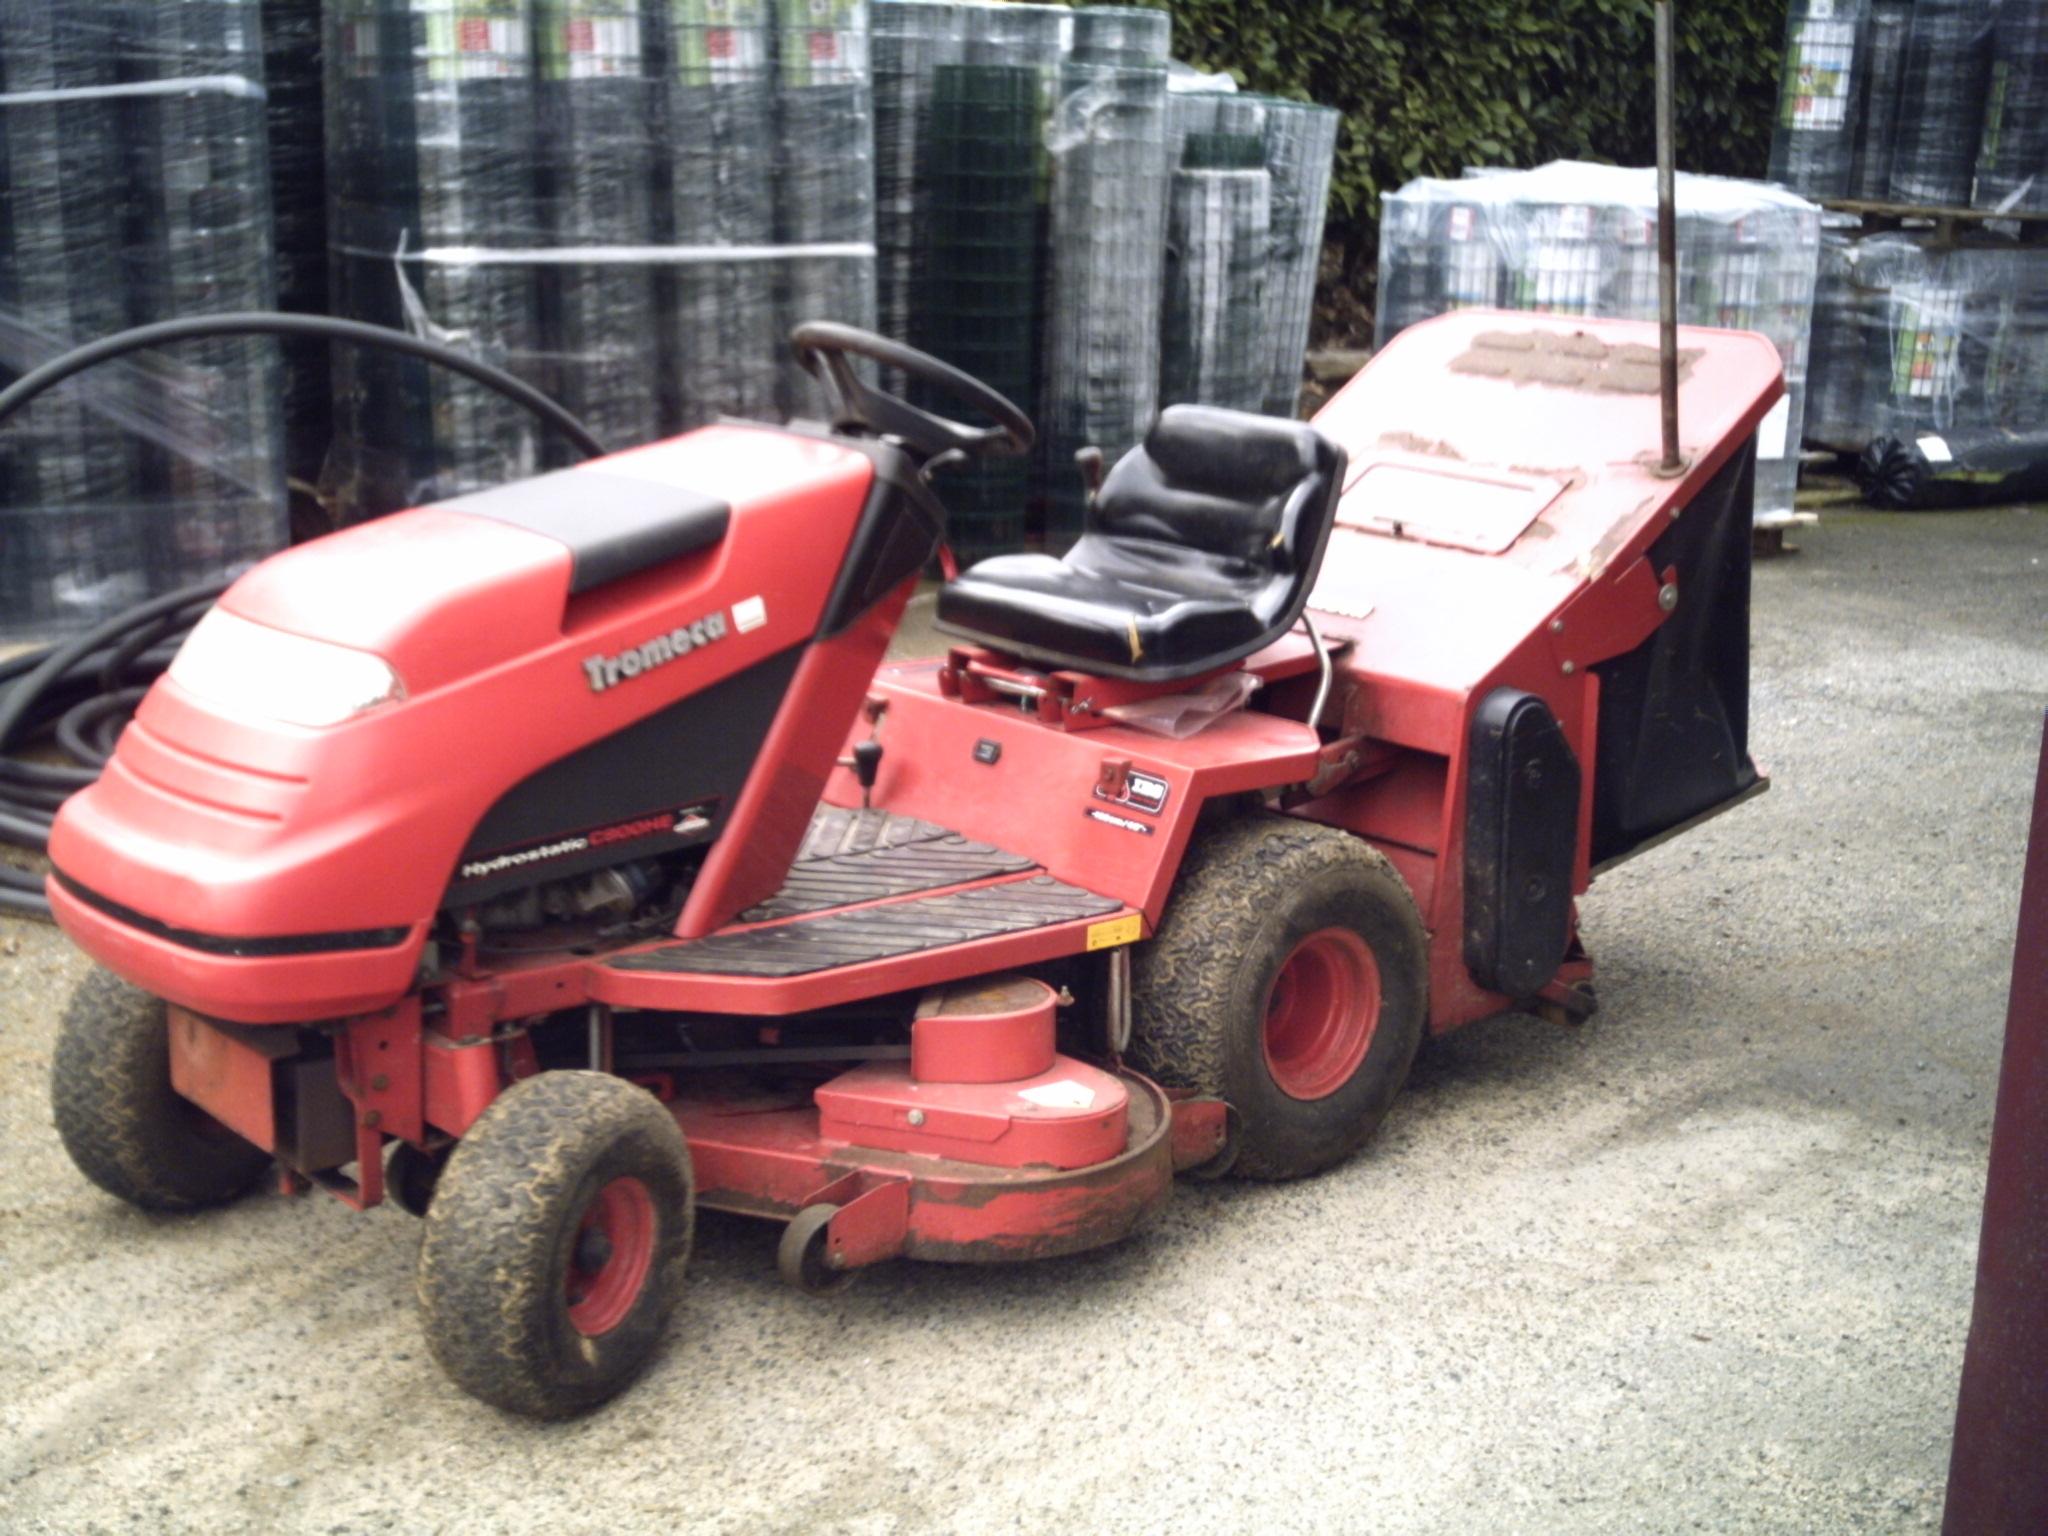 tracteur tondeuse countax occasion tracteur agricole. Black Bedroom Furniture Sets. Home Design Ideas